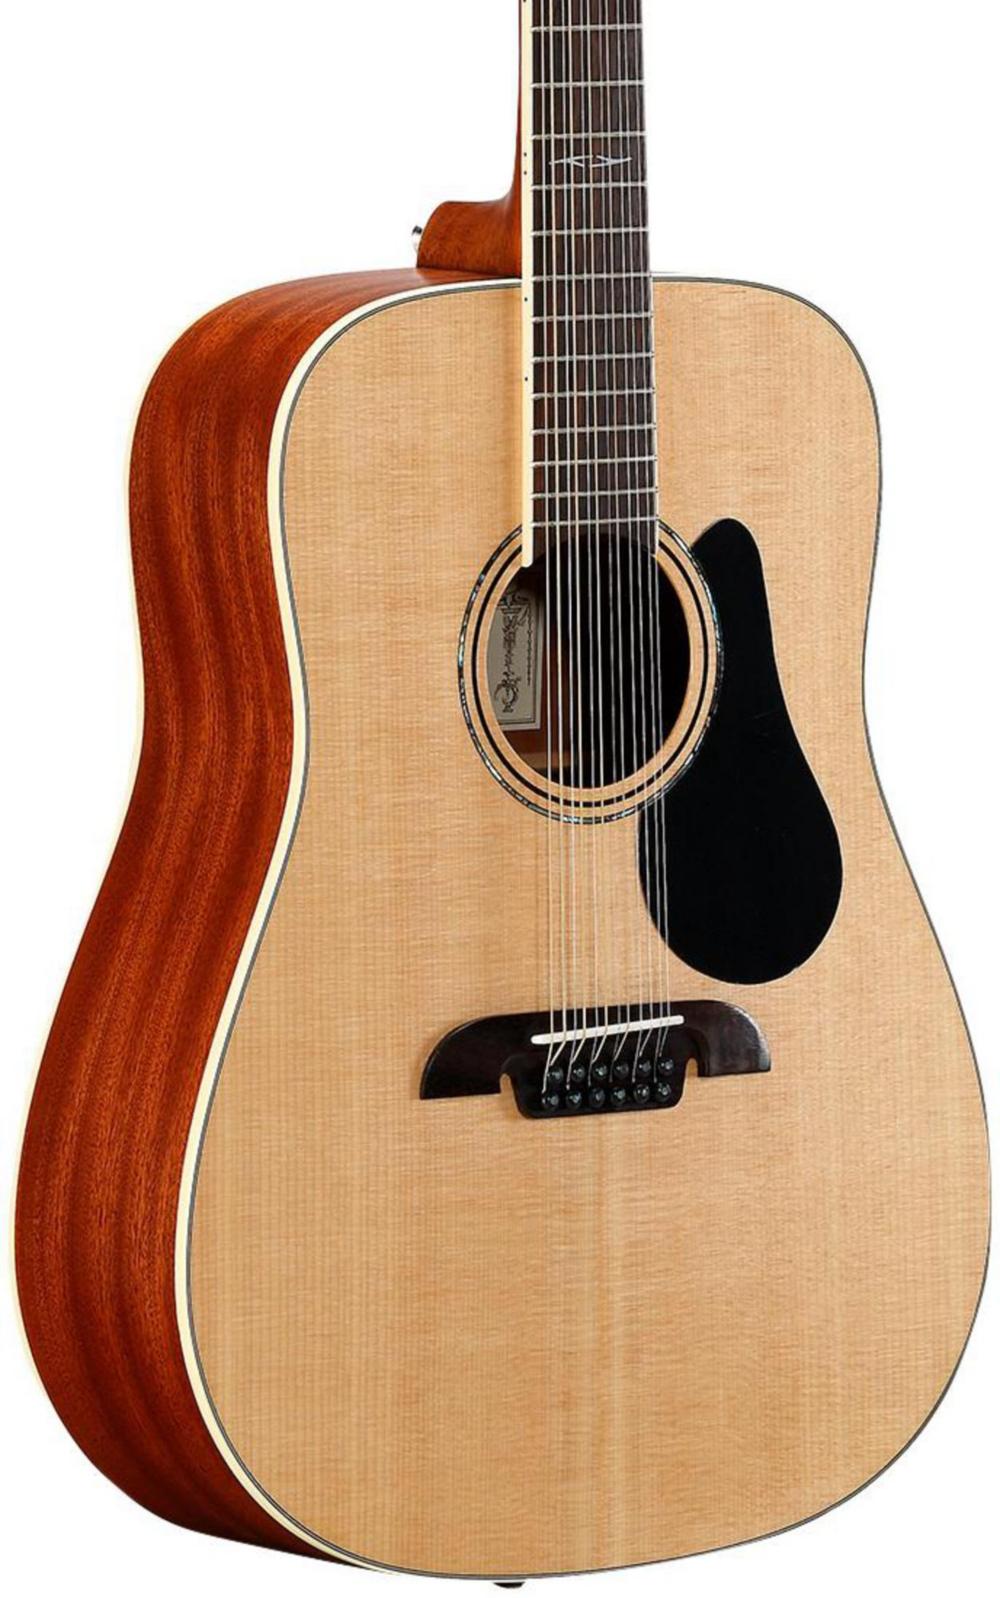 Artist Series AD60-12 Dreadnought Twelve String Acoustic Guitar by Alvarez